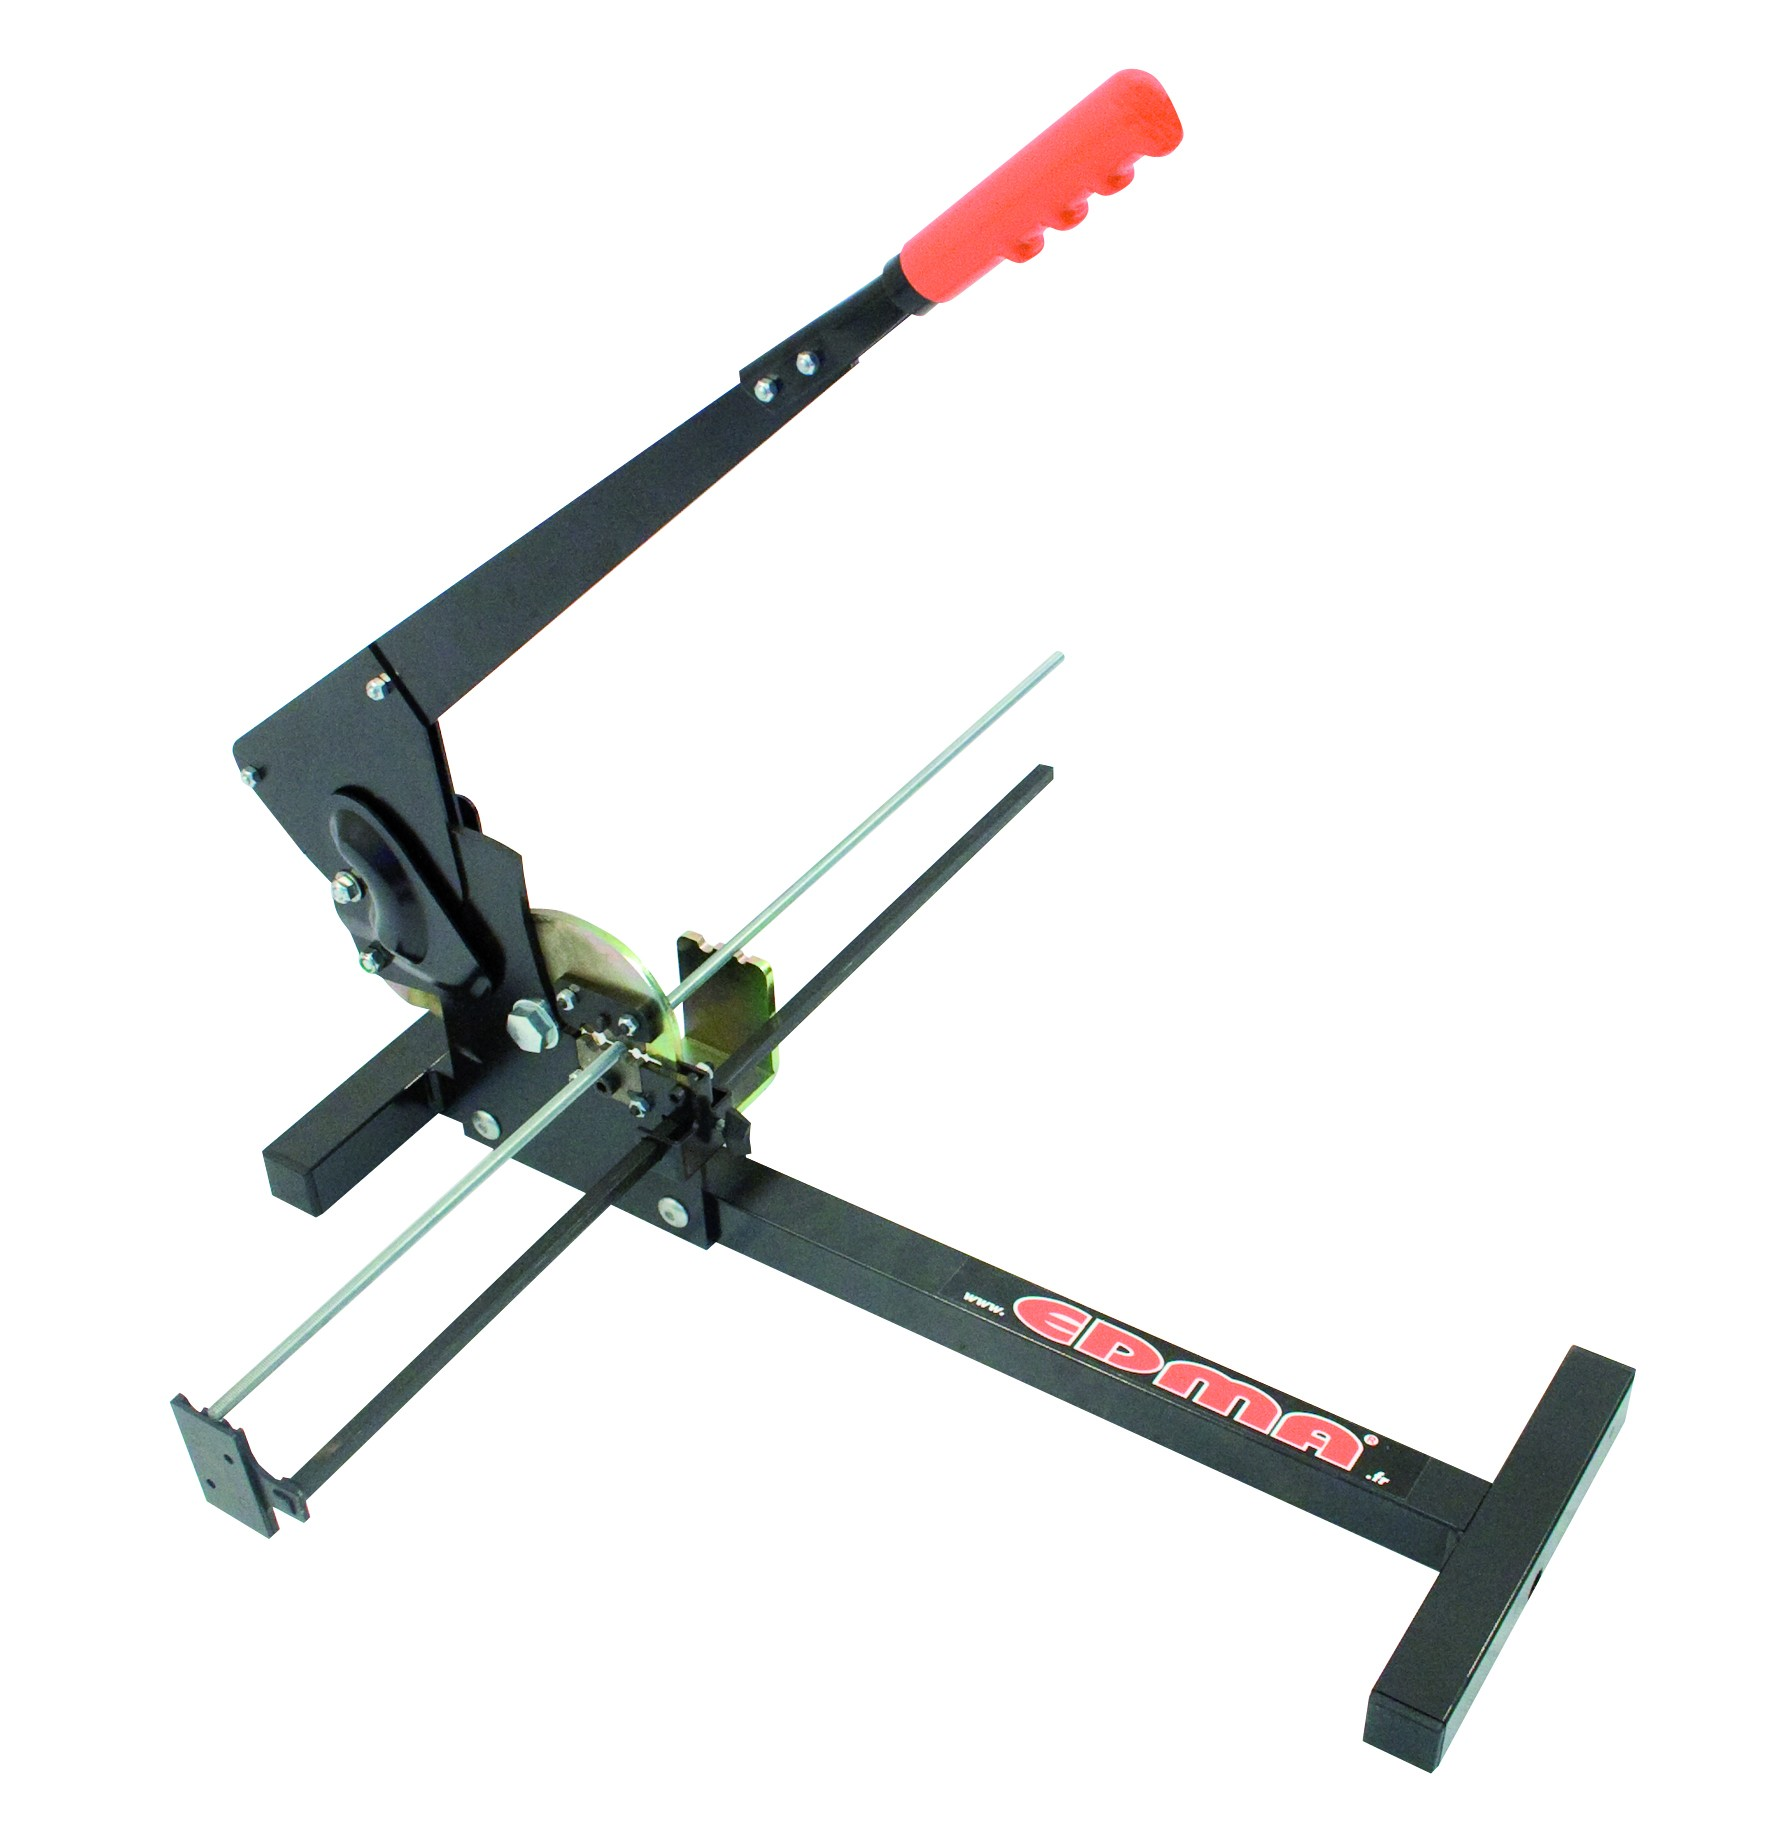 Afbeelding van Edma 99110659 Draadeindknipper Rodcut voor 6 / 7 8 10 mm